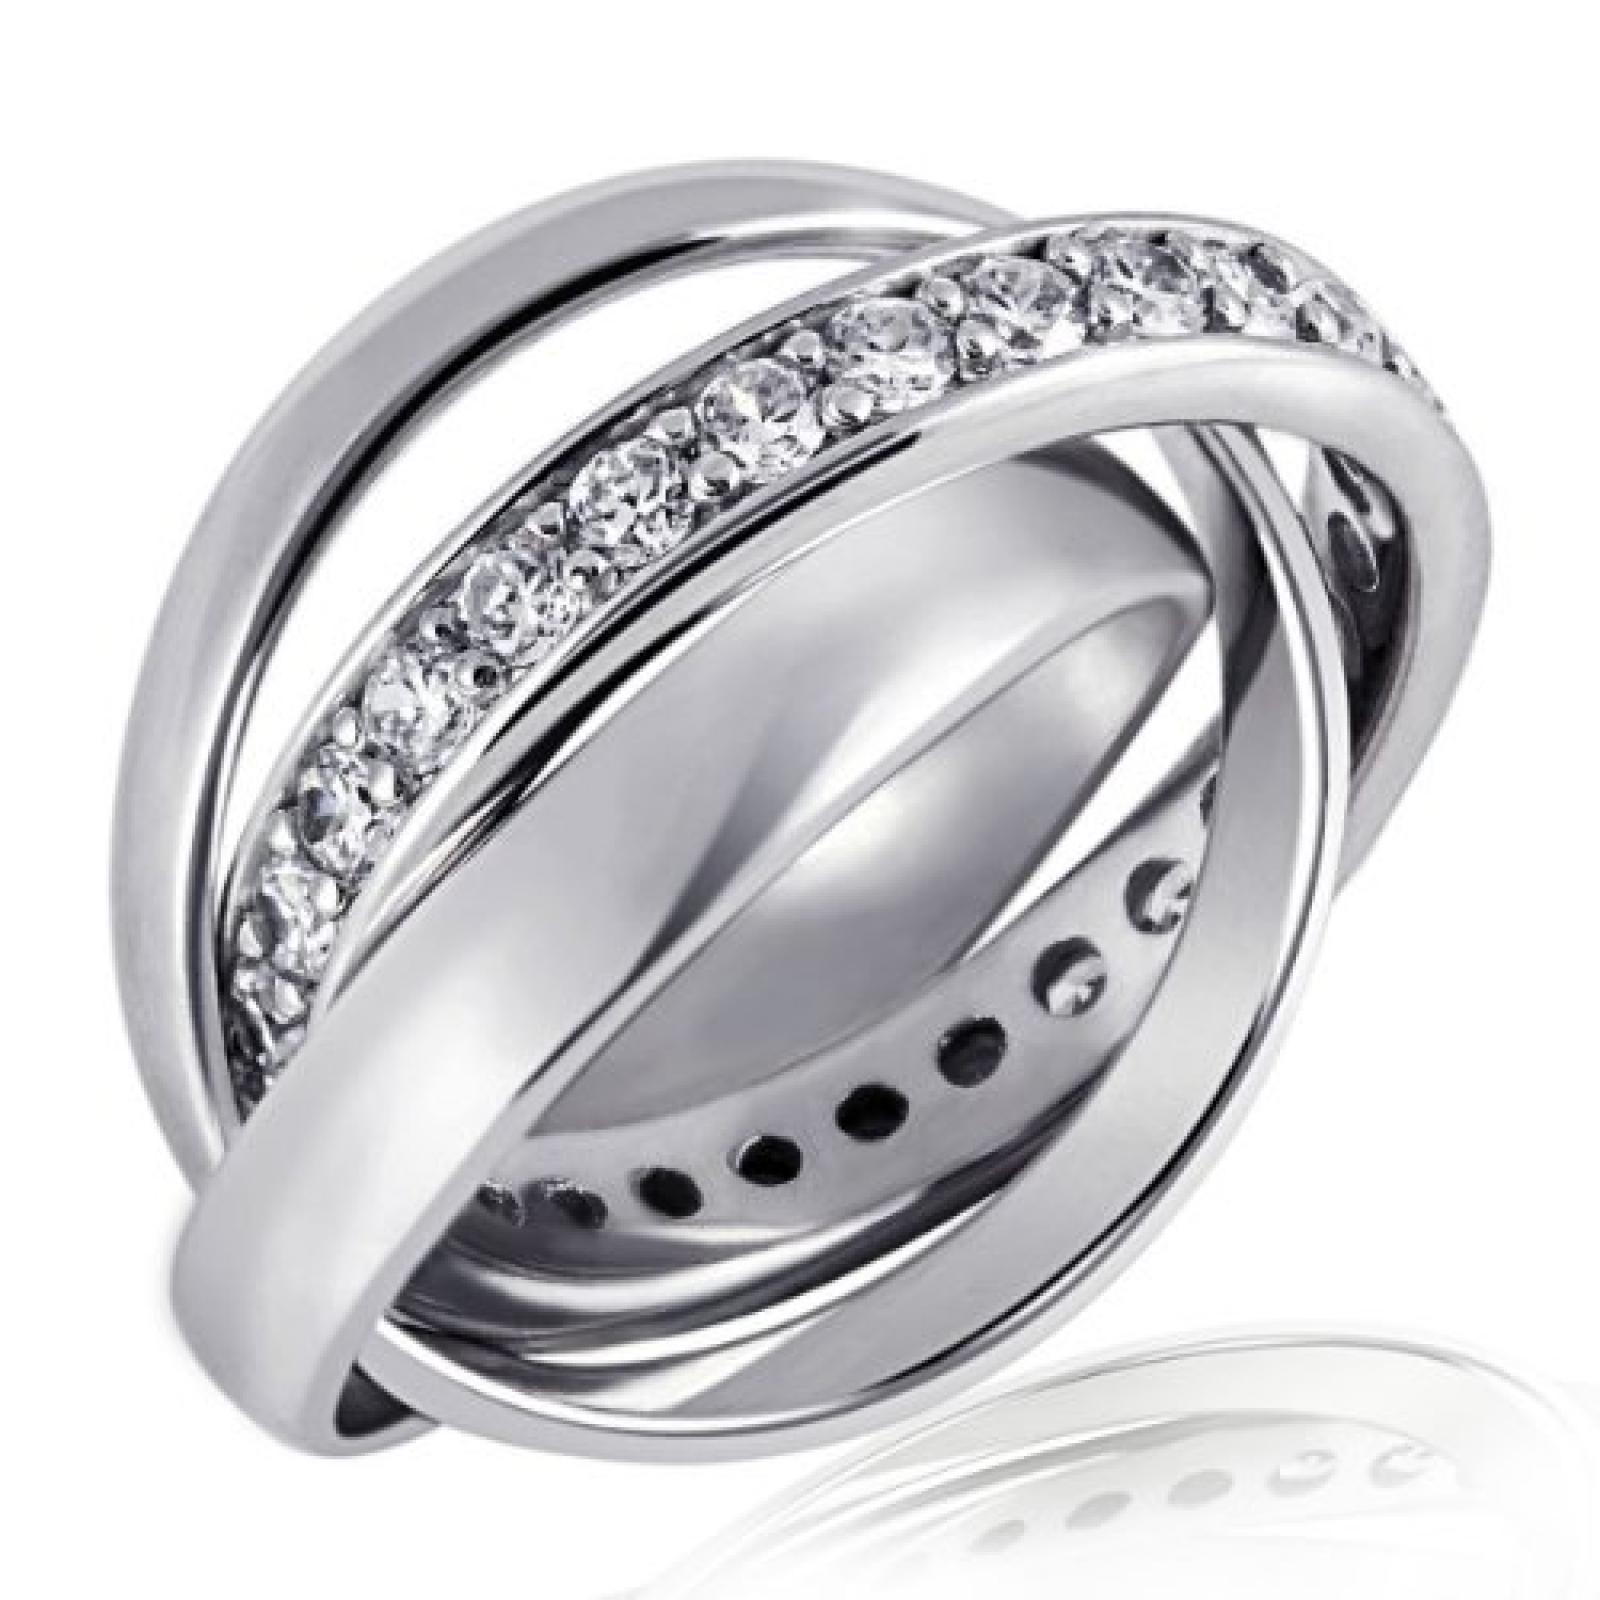 Goldmaid Ring 3 in 1 925 Sterlingsilber 32 Steine